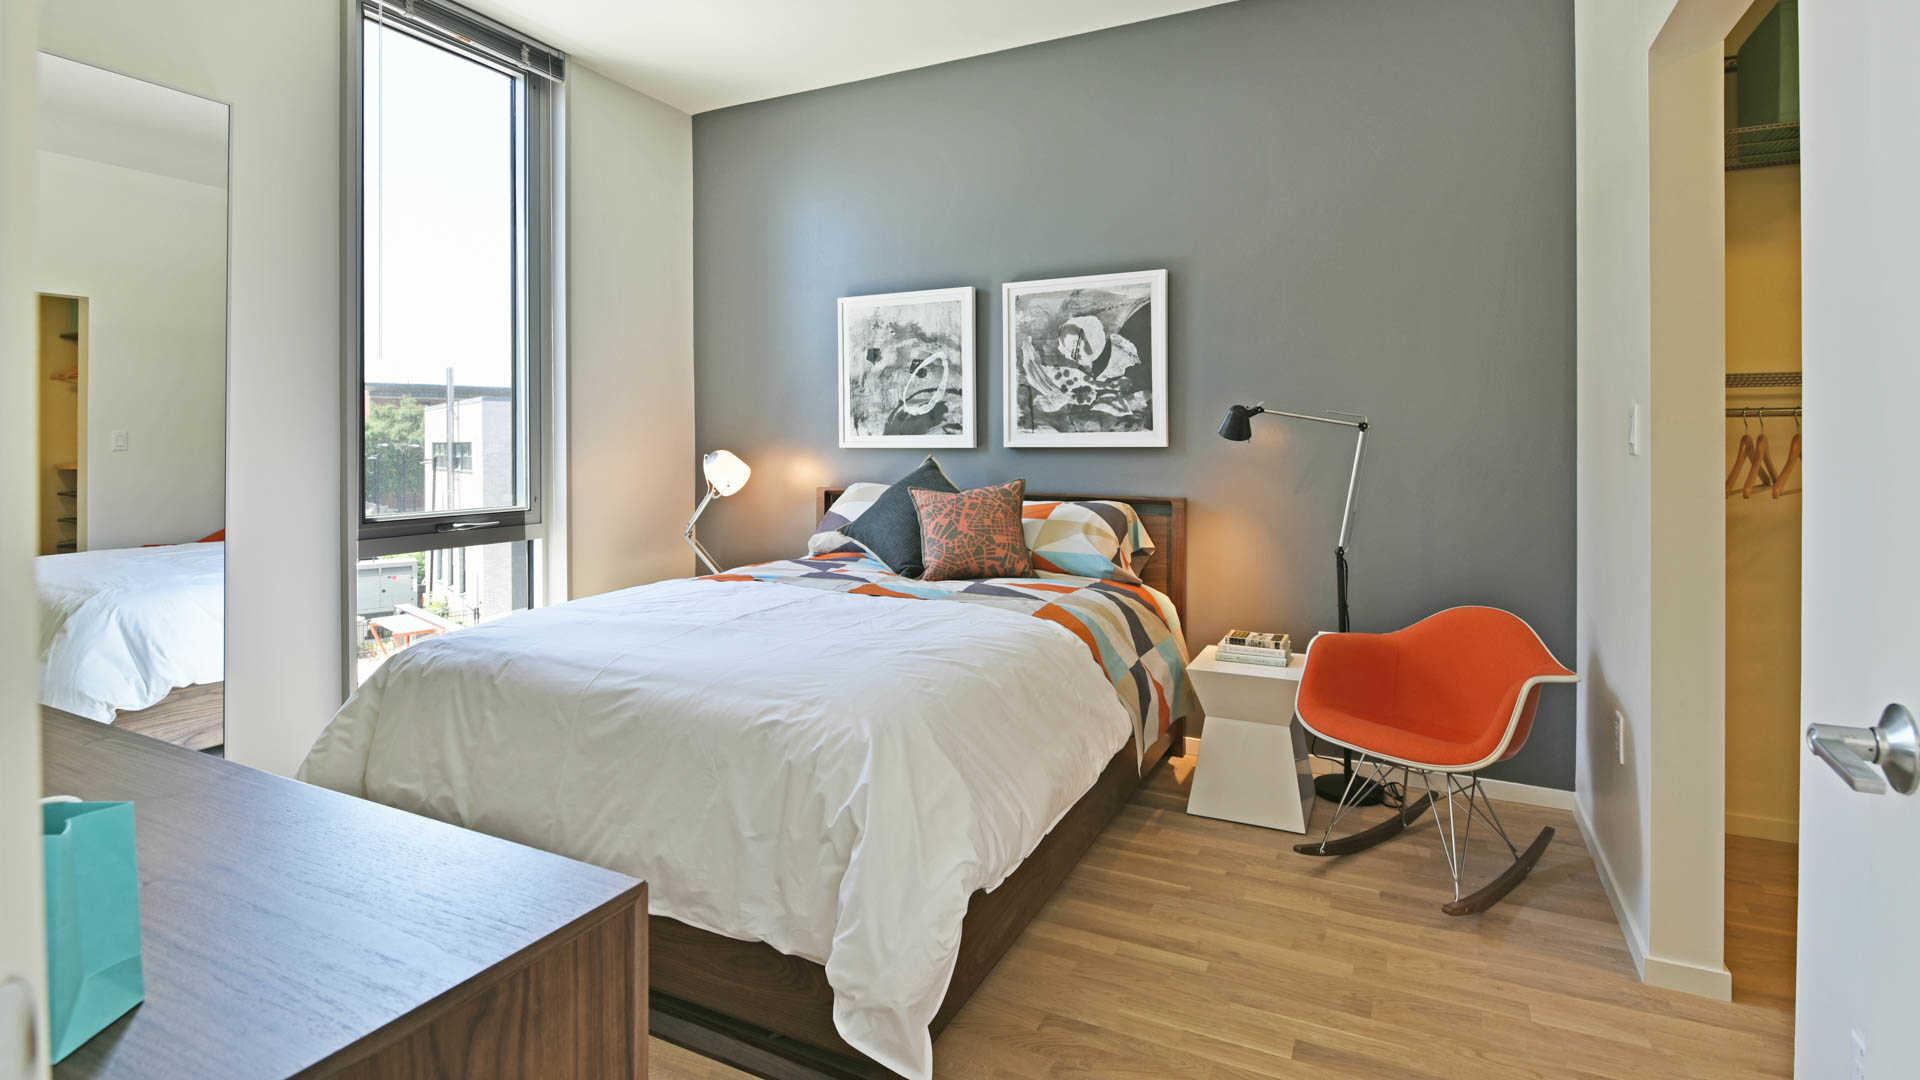 Girard apartments bedroom